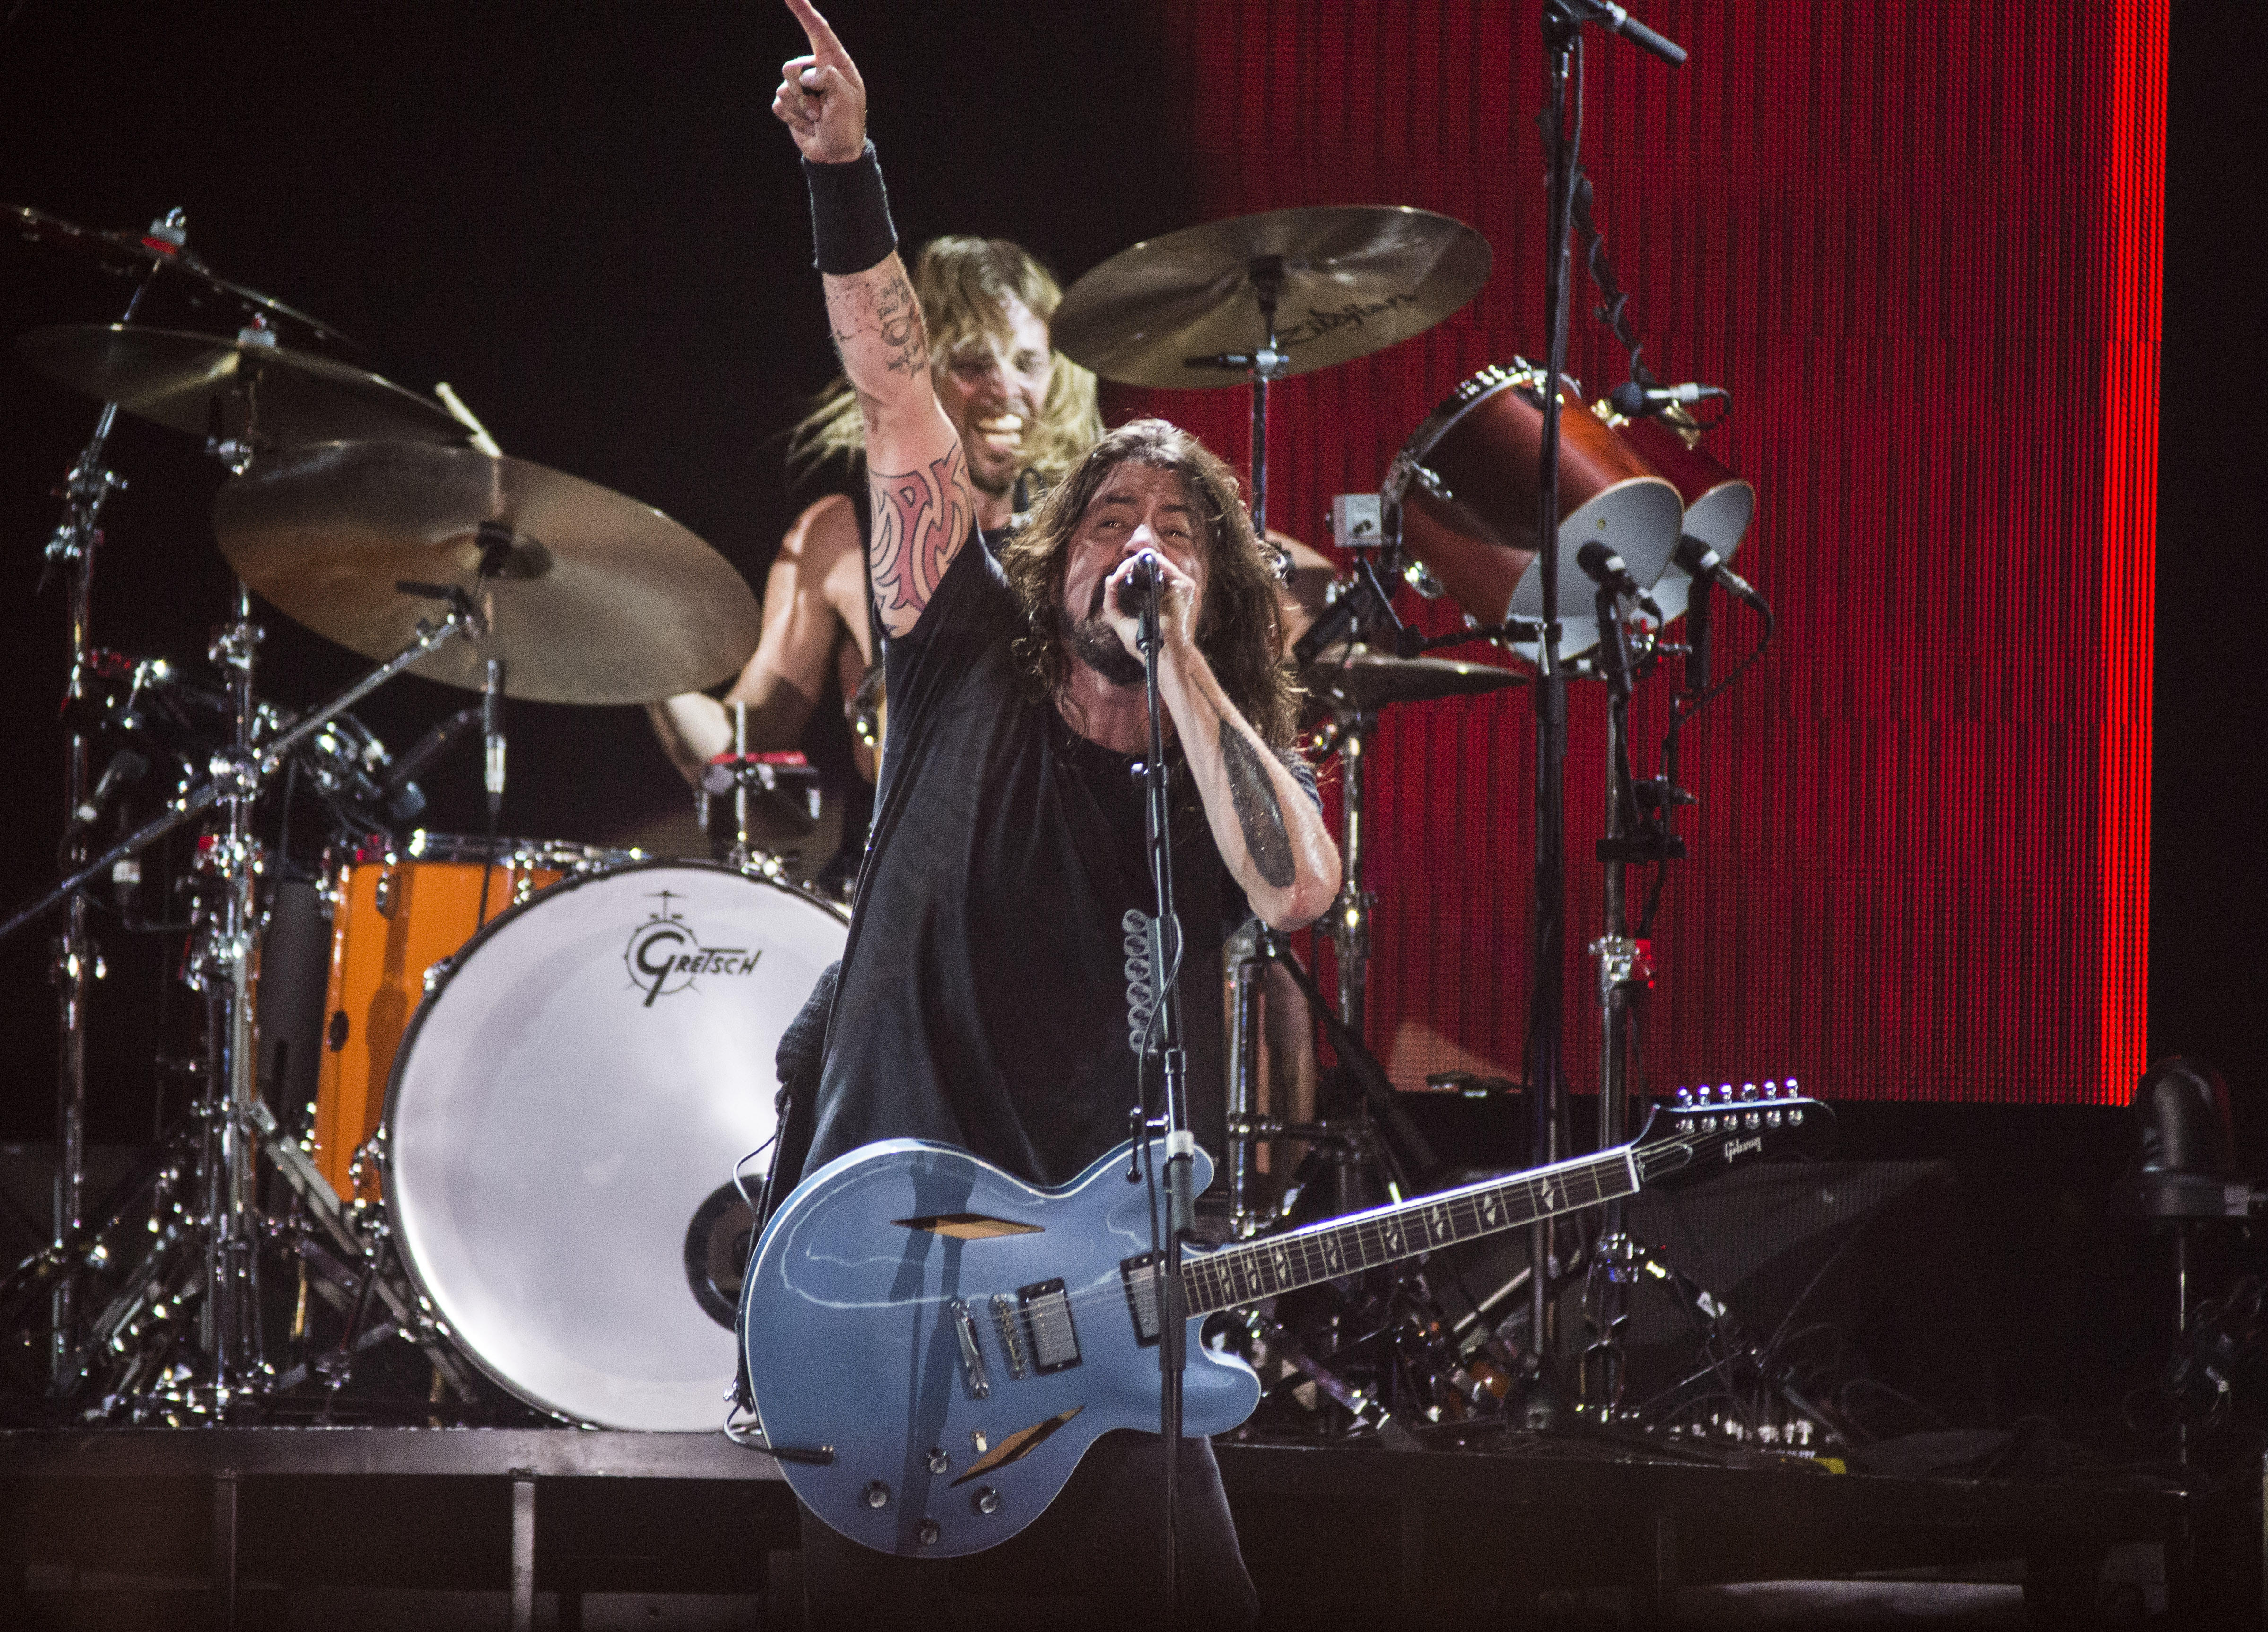 RIO DE JANEIRO, BRAZIL - JANUARY 25: Foo Fighters perform at Maracana on January 25, 2015 in Rio de Janeiro, Brazil. (Photo b